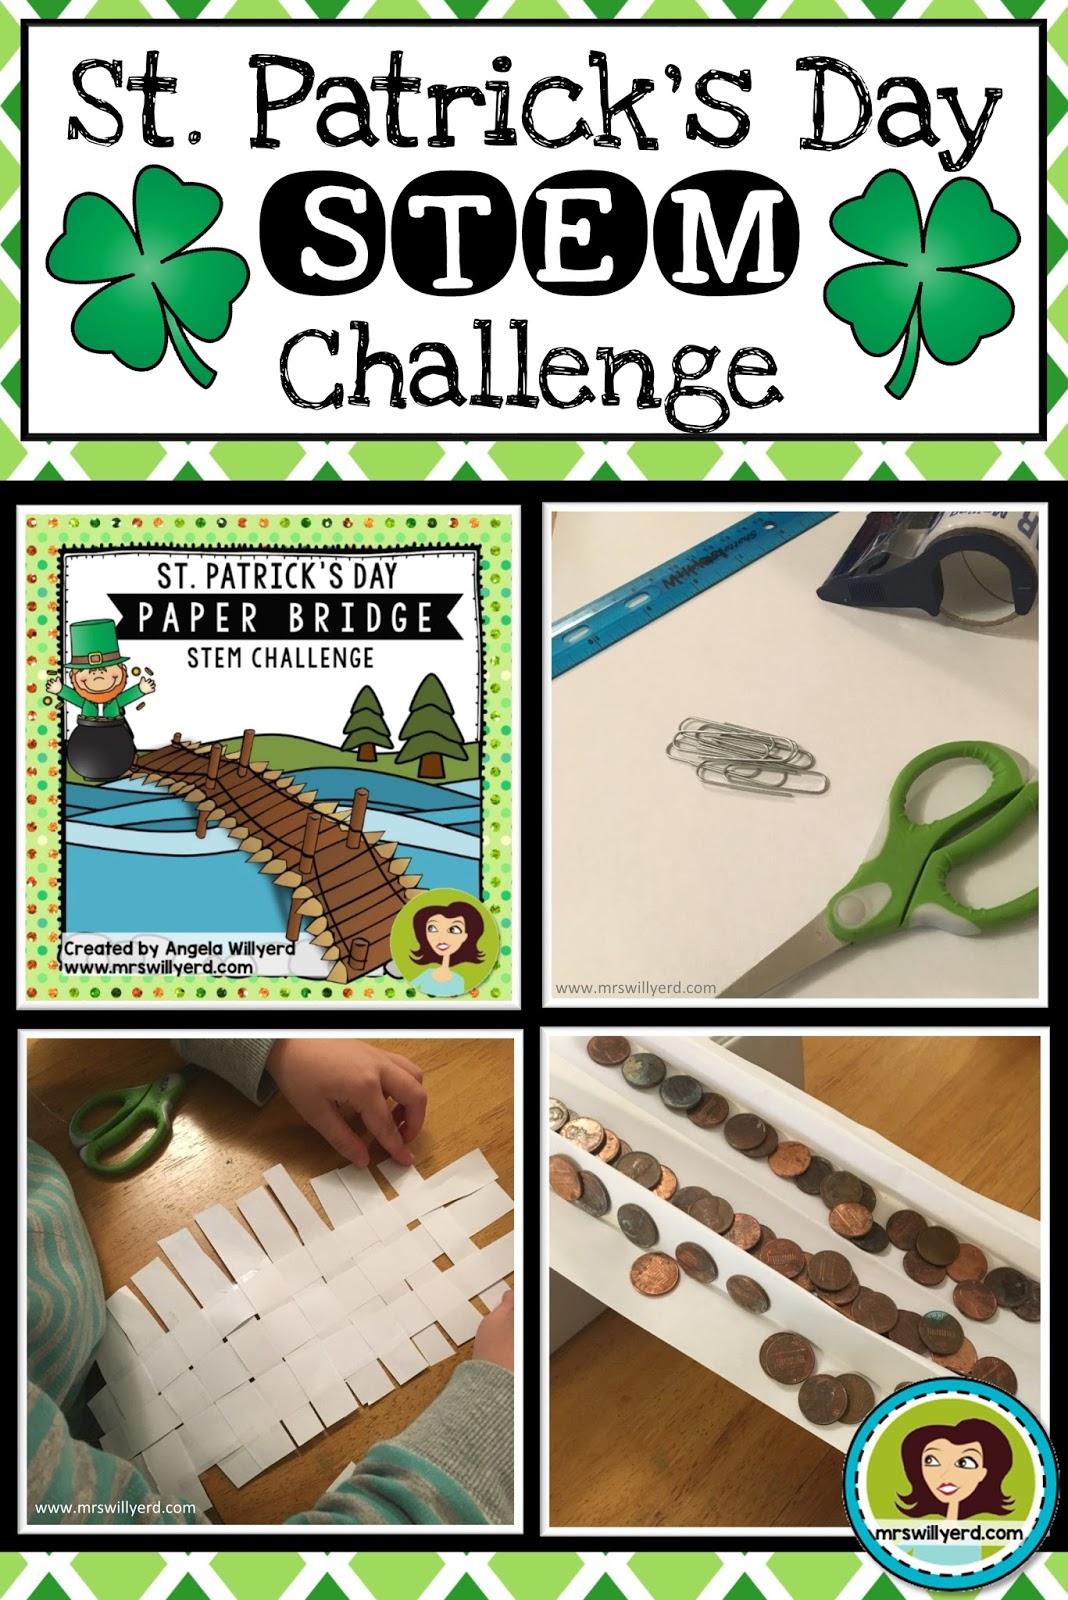 Mrs Willyerds Virtual Classroom St Patricks Day Stem Challenge